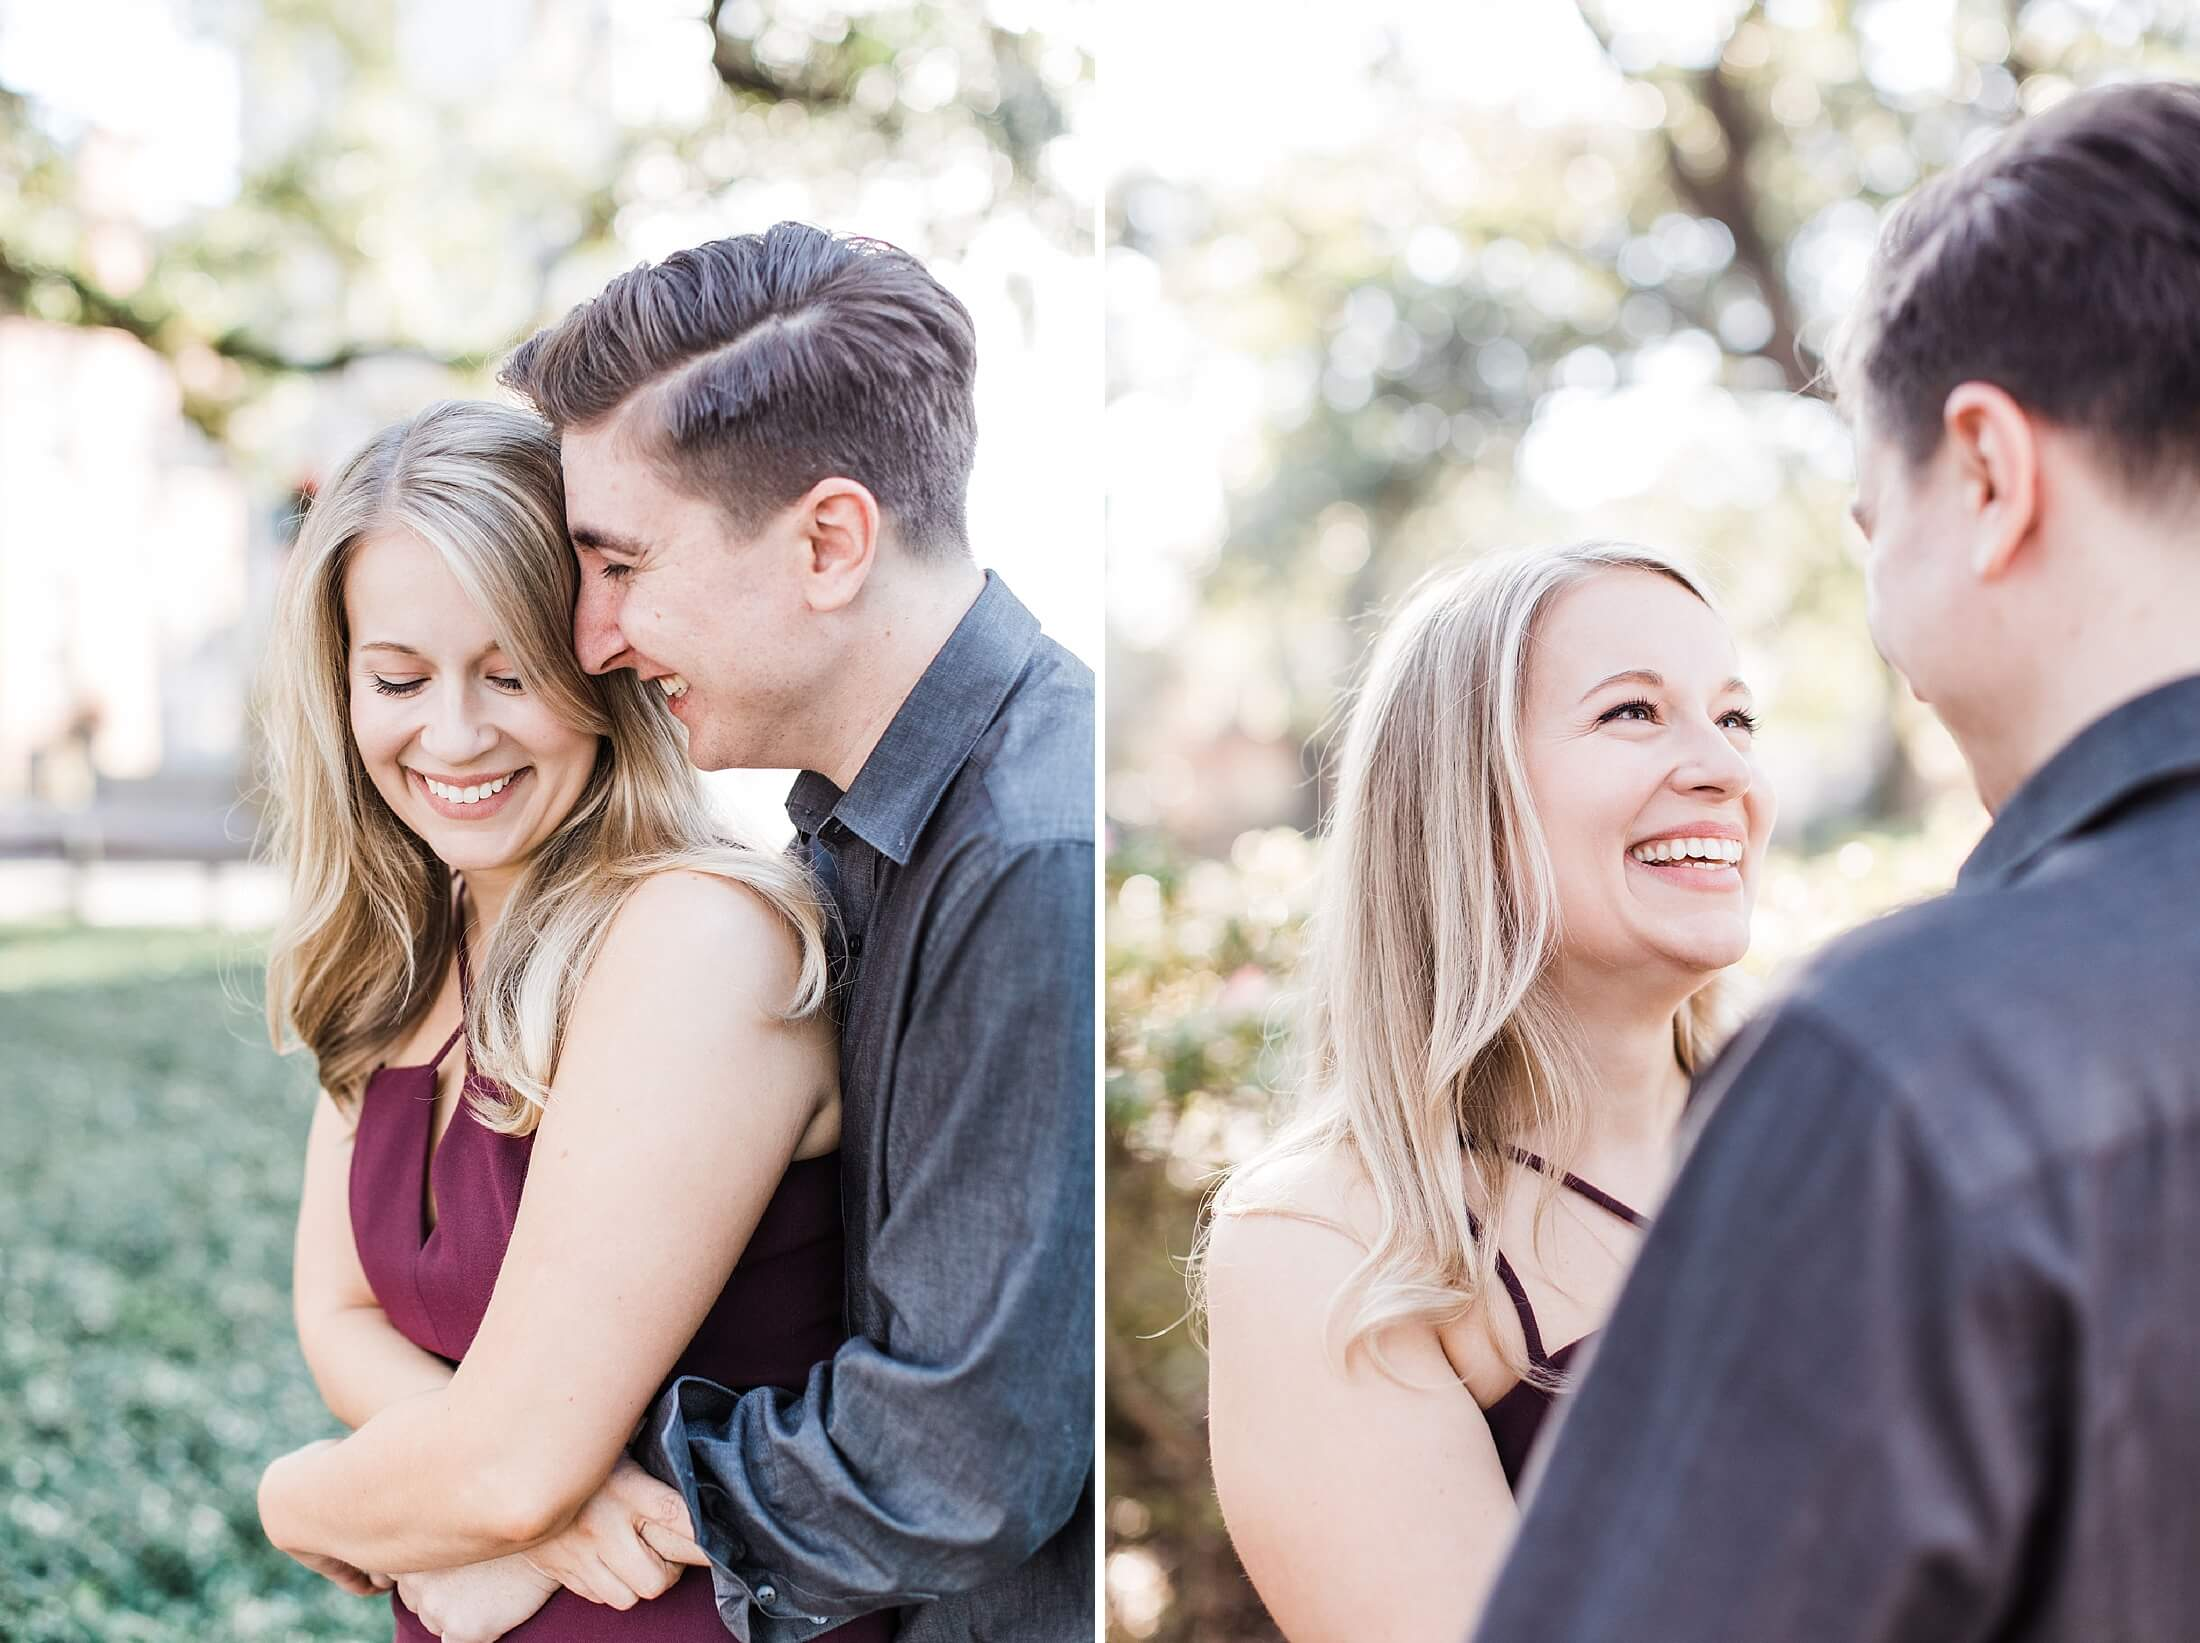 Apt-b-photography-savannah-engagement-photographer-savannah-wedding-hilton-head-elopement-savannah-wedding-photographer-10.jpg